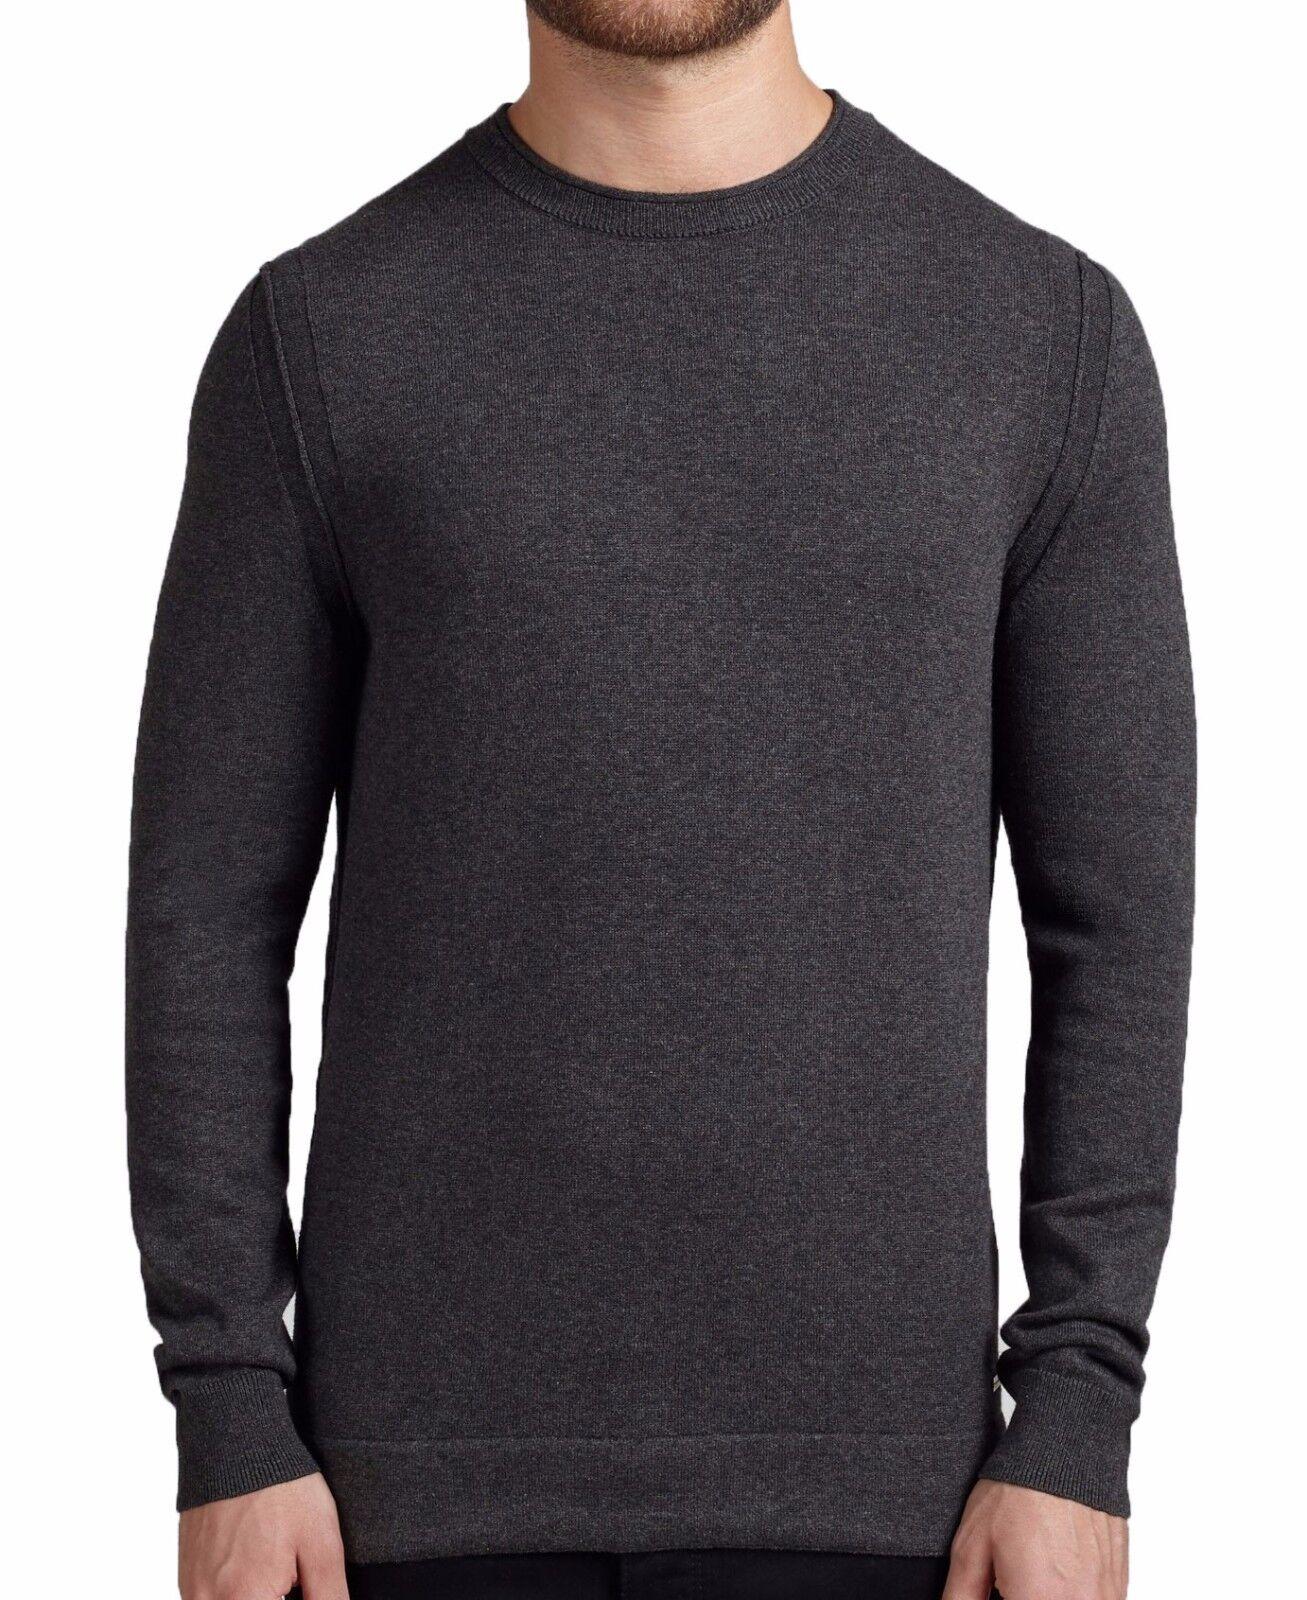 BOSS Orange Pullover in XL ( Regular Fit ) dark Grau SOFT COTTON-WOOL